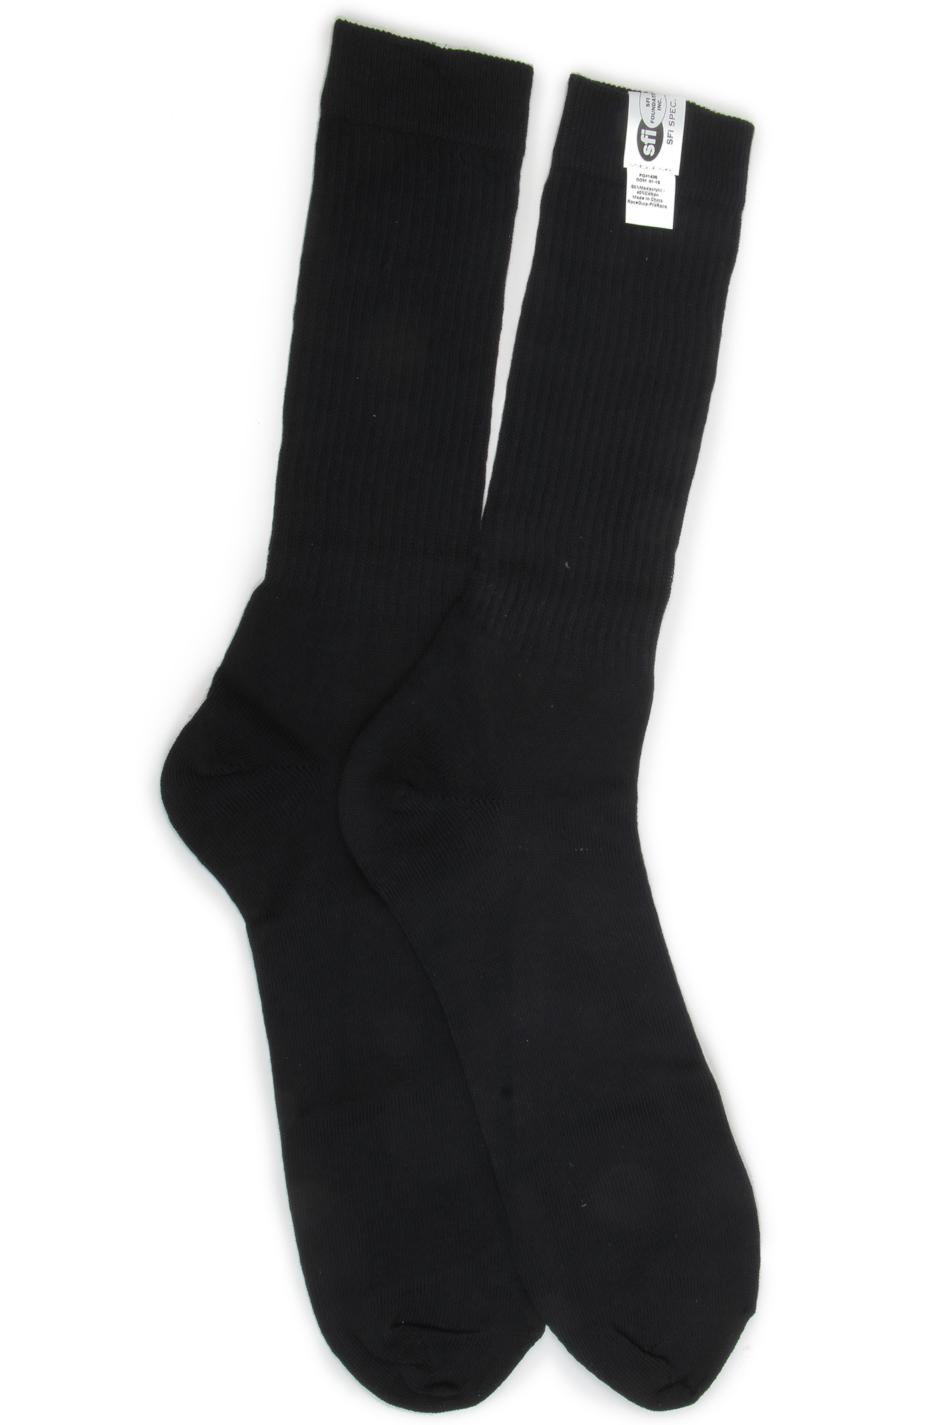 Racequip Socks FR Medium 8-9 Black SFI 3.3